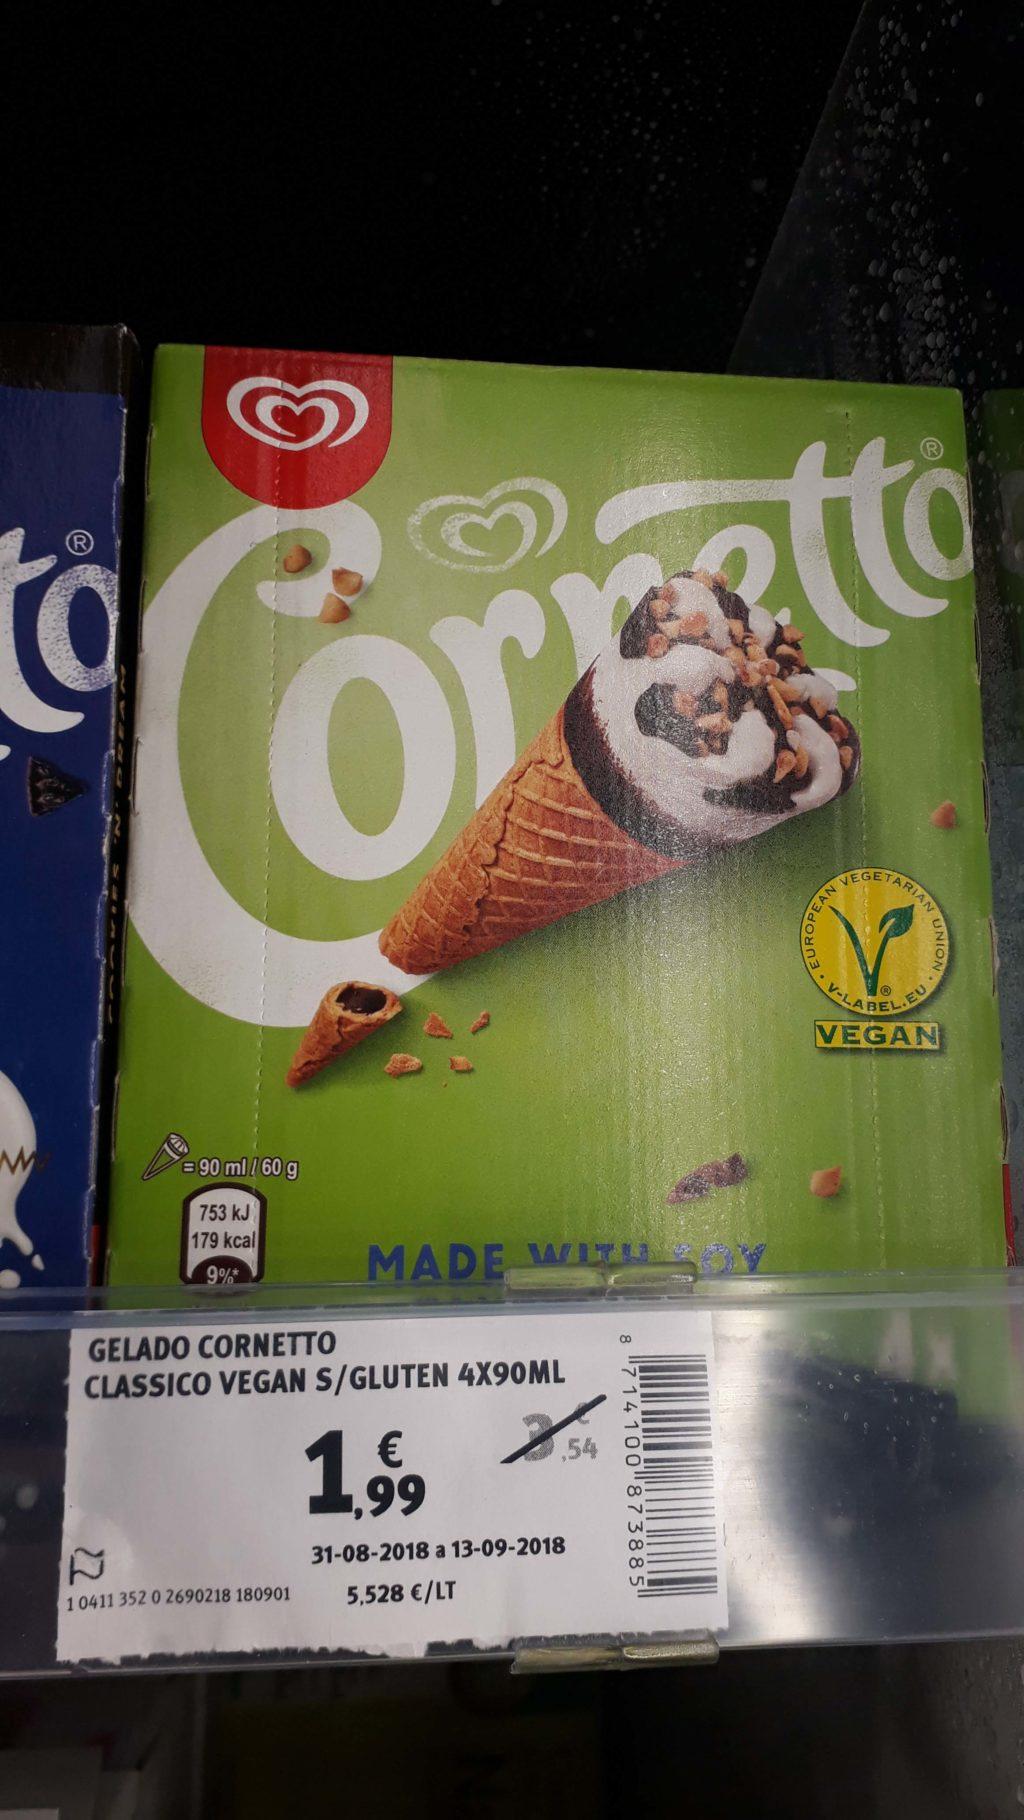 Vegan and gluten-free cornetto ice cream